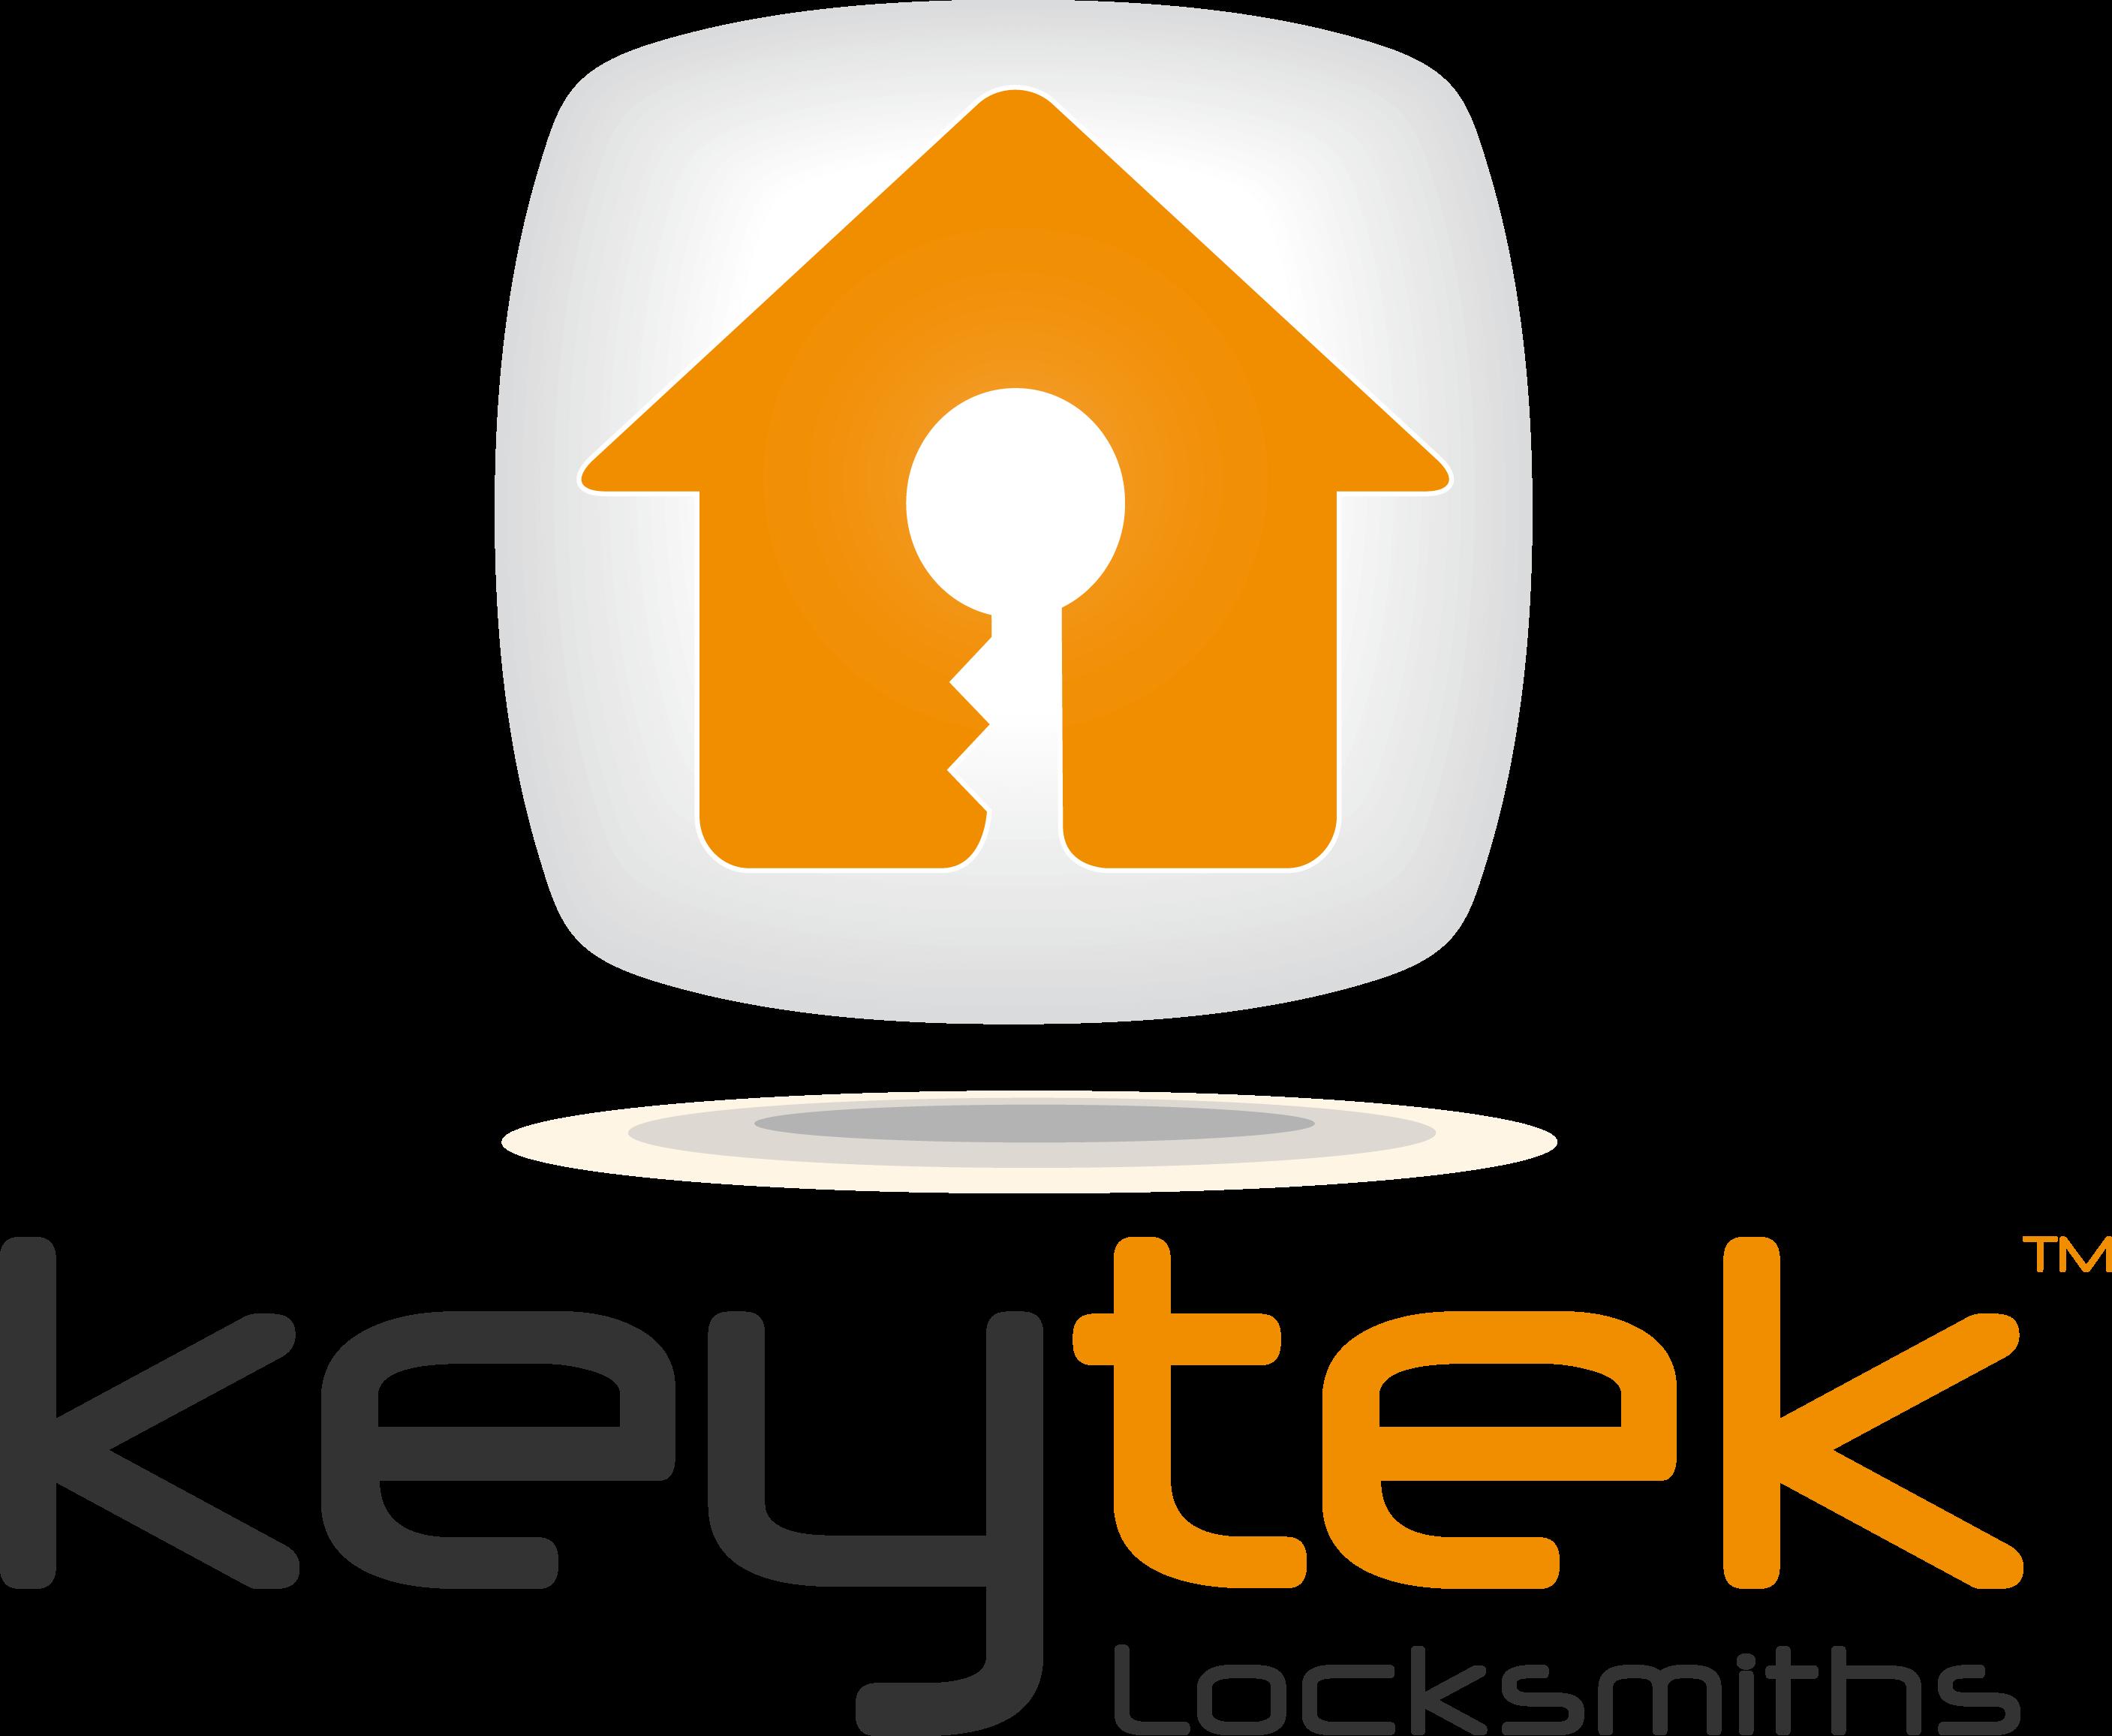 Trowbridge Keytek Locksmiths